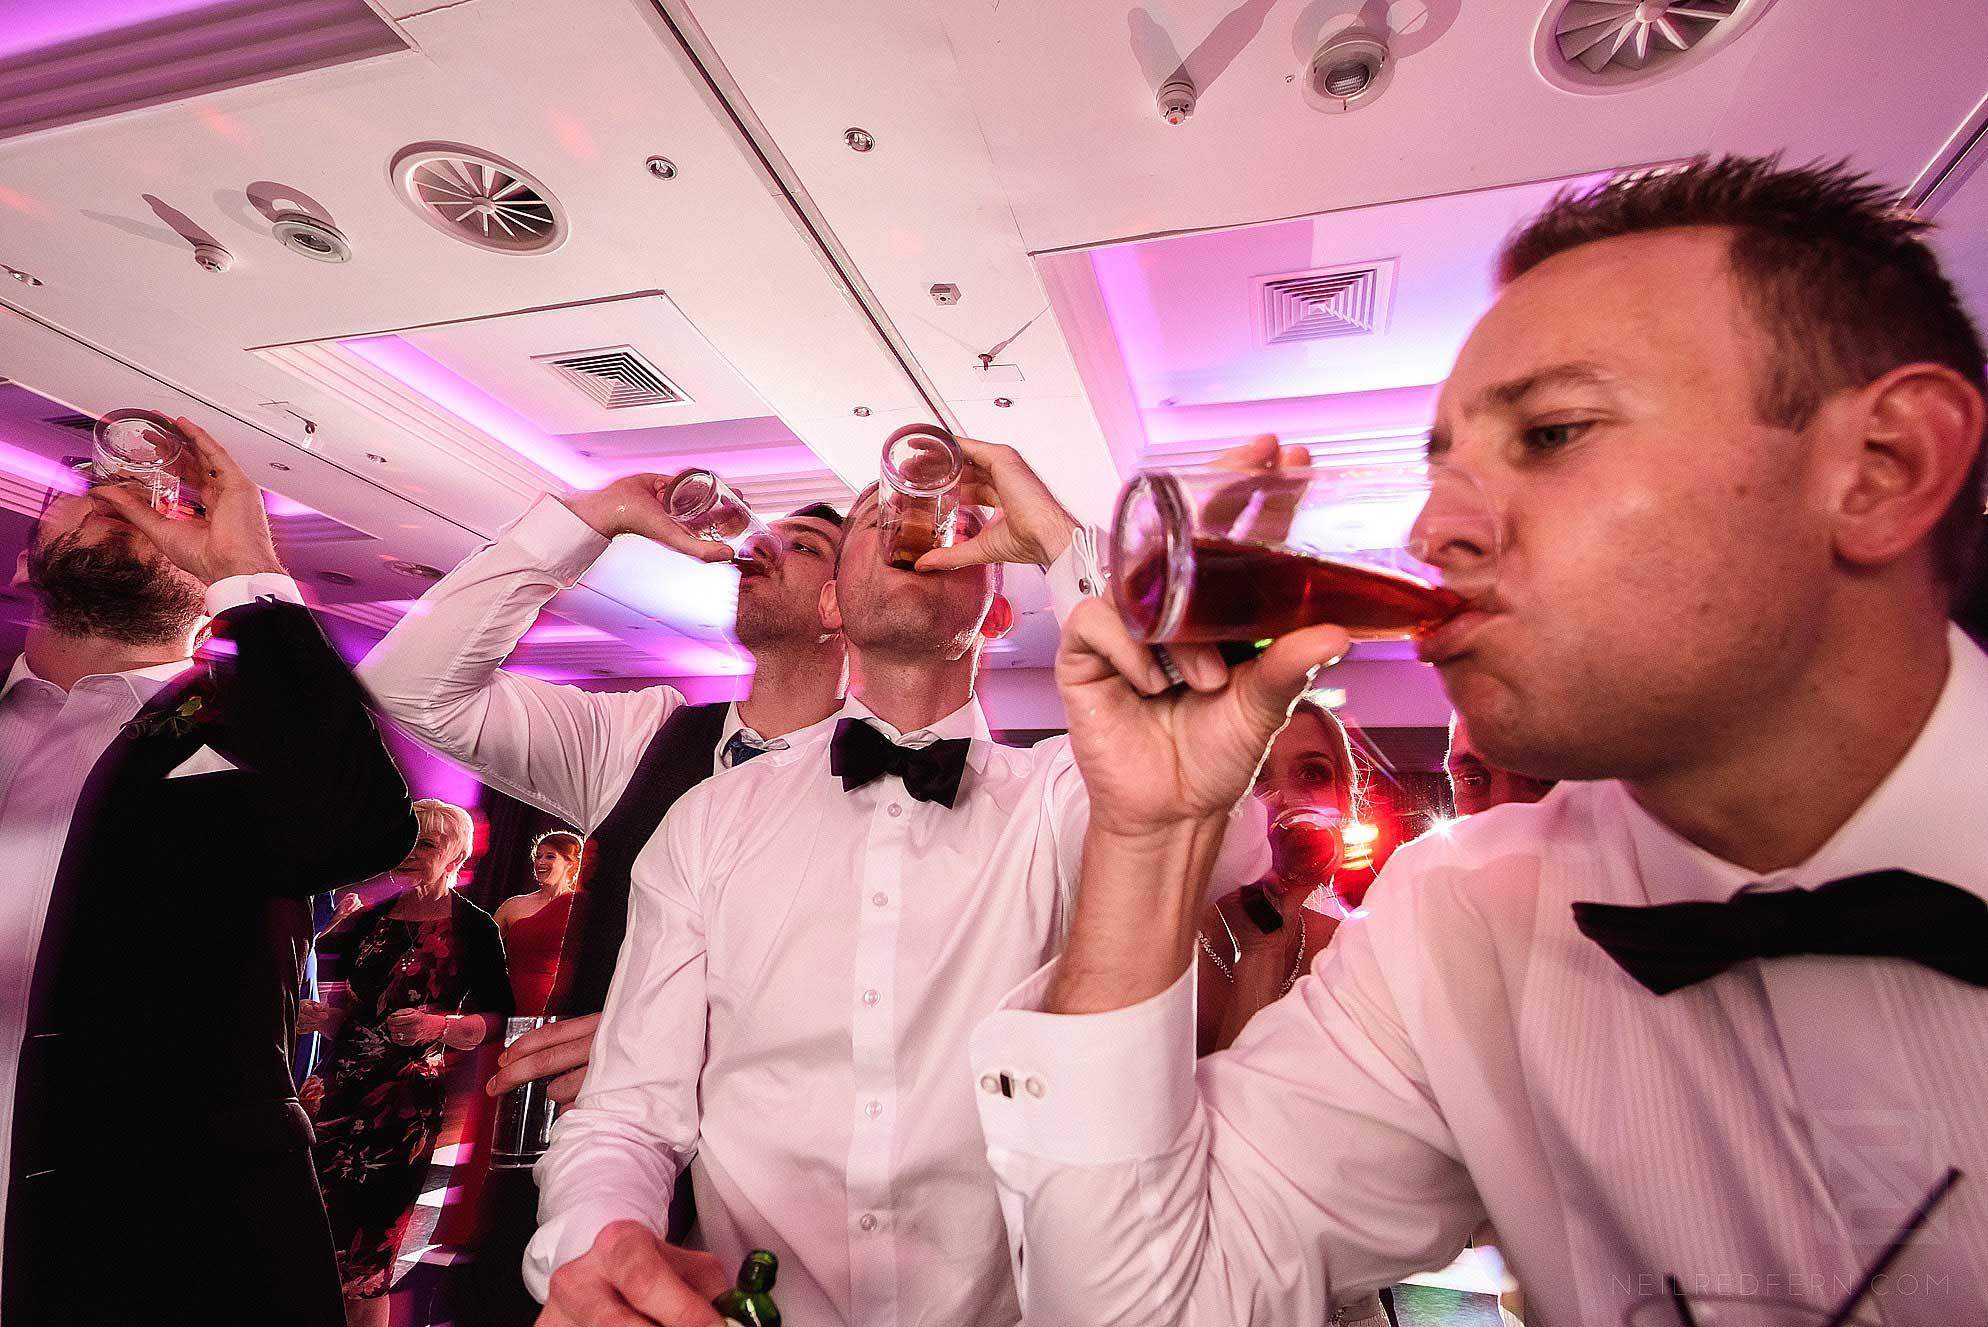 groomsmen drinking shots